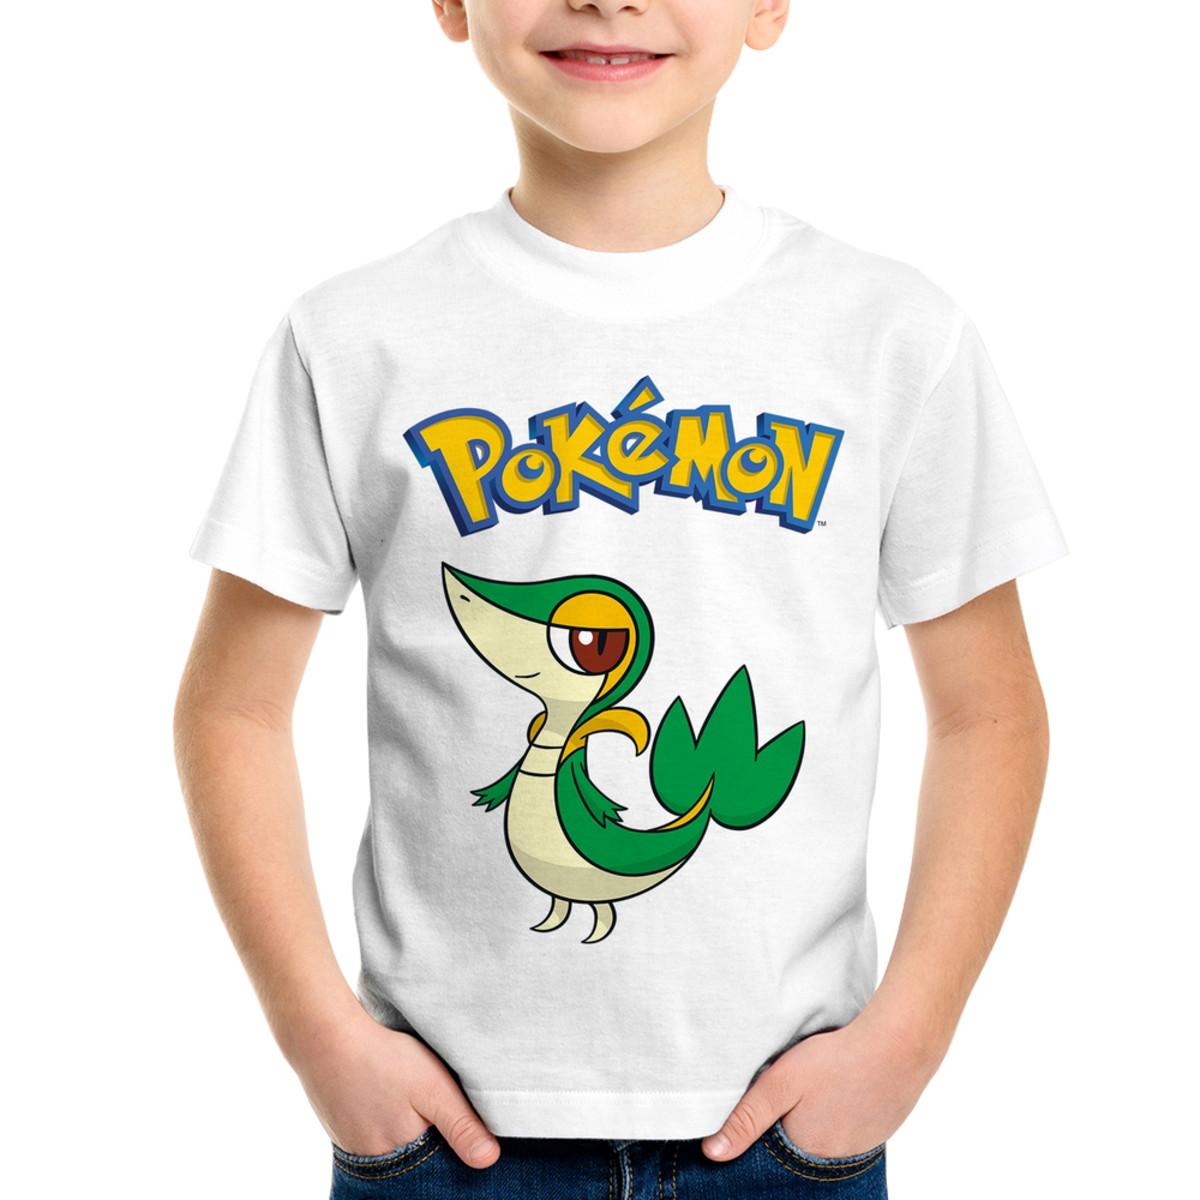 6ebda34af6 Camiseta Infantil Pokémon Snivy no Elo7